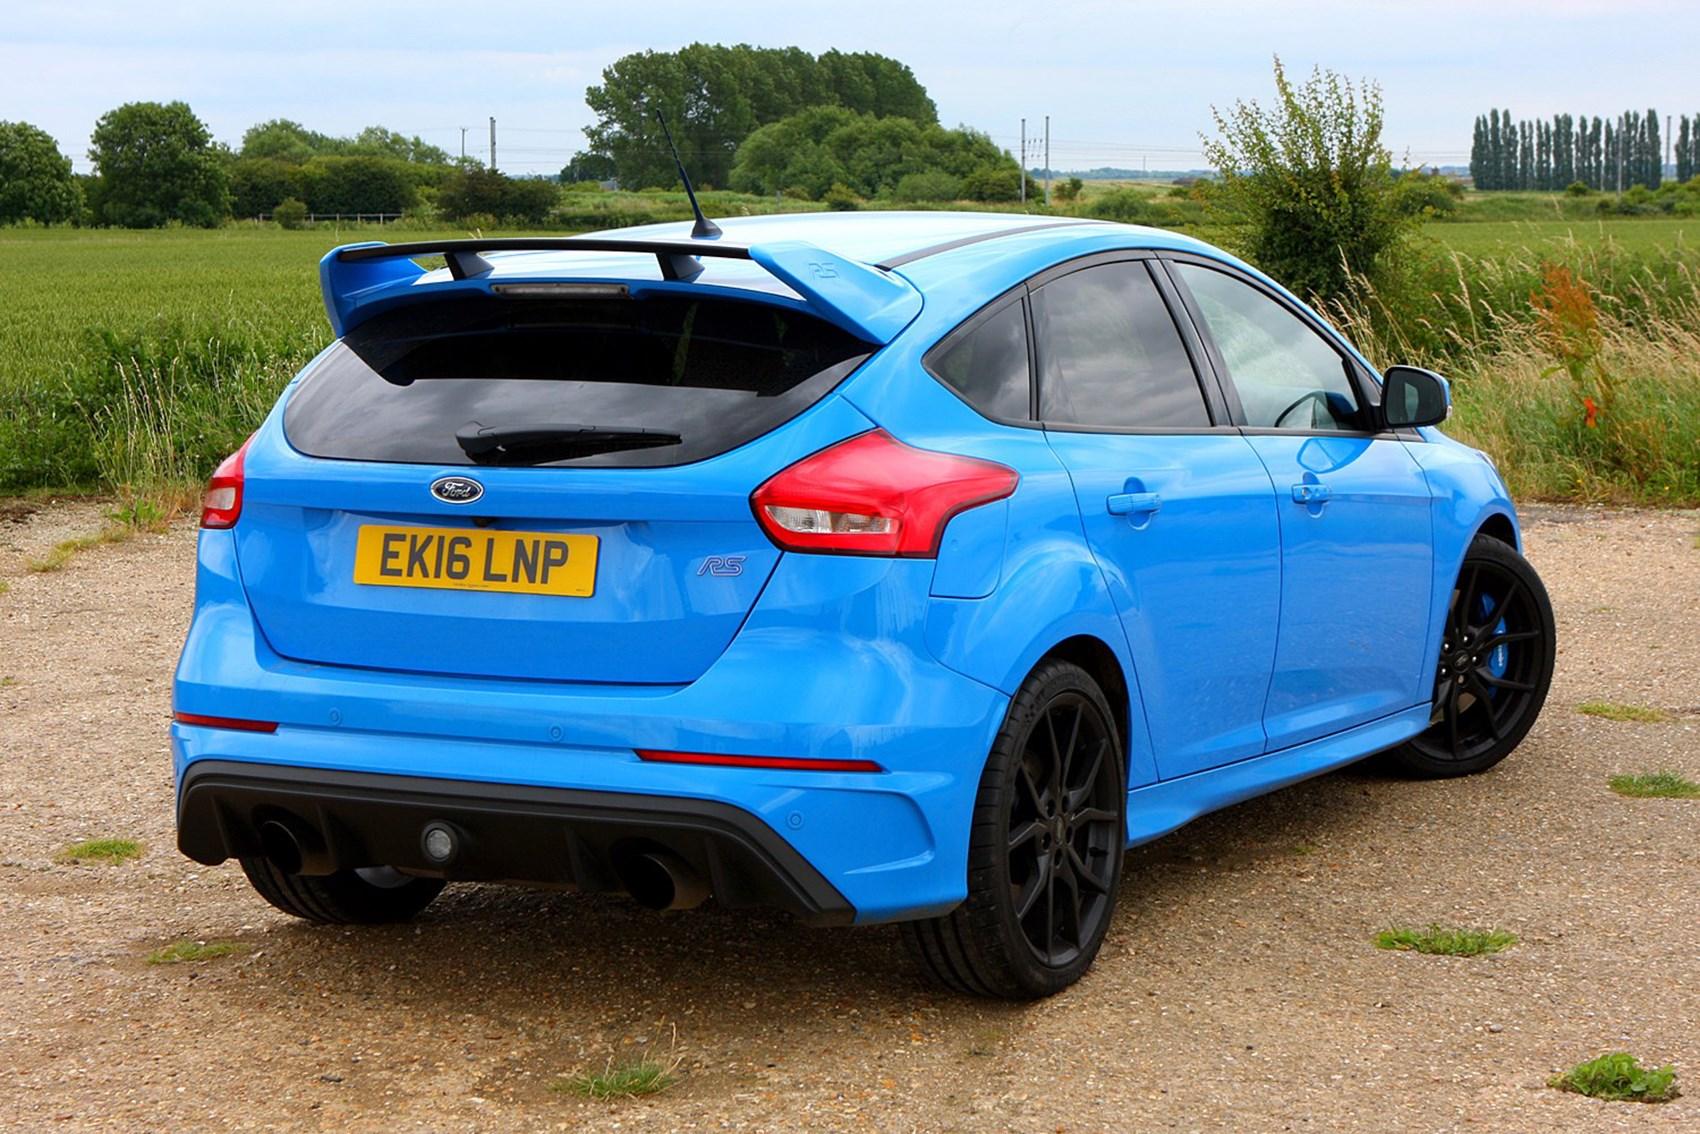 Ford Focus RS - the best hot hatchbacks